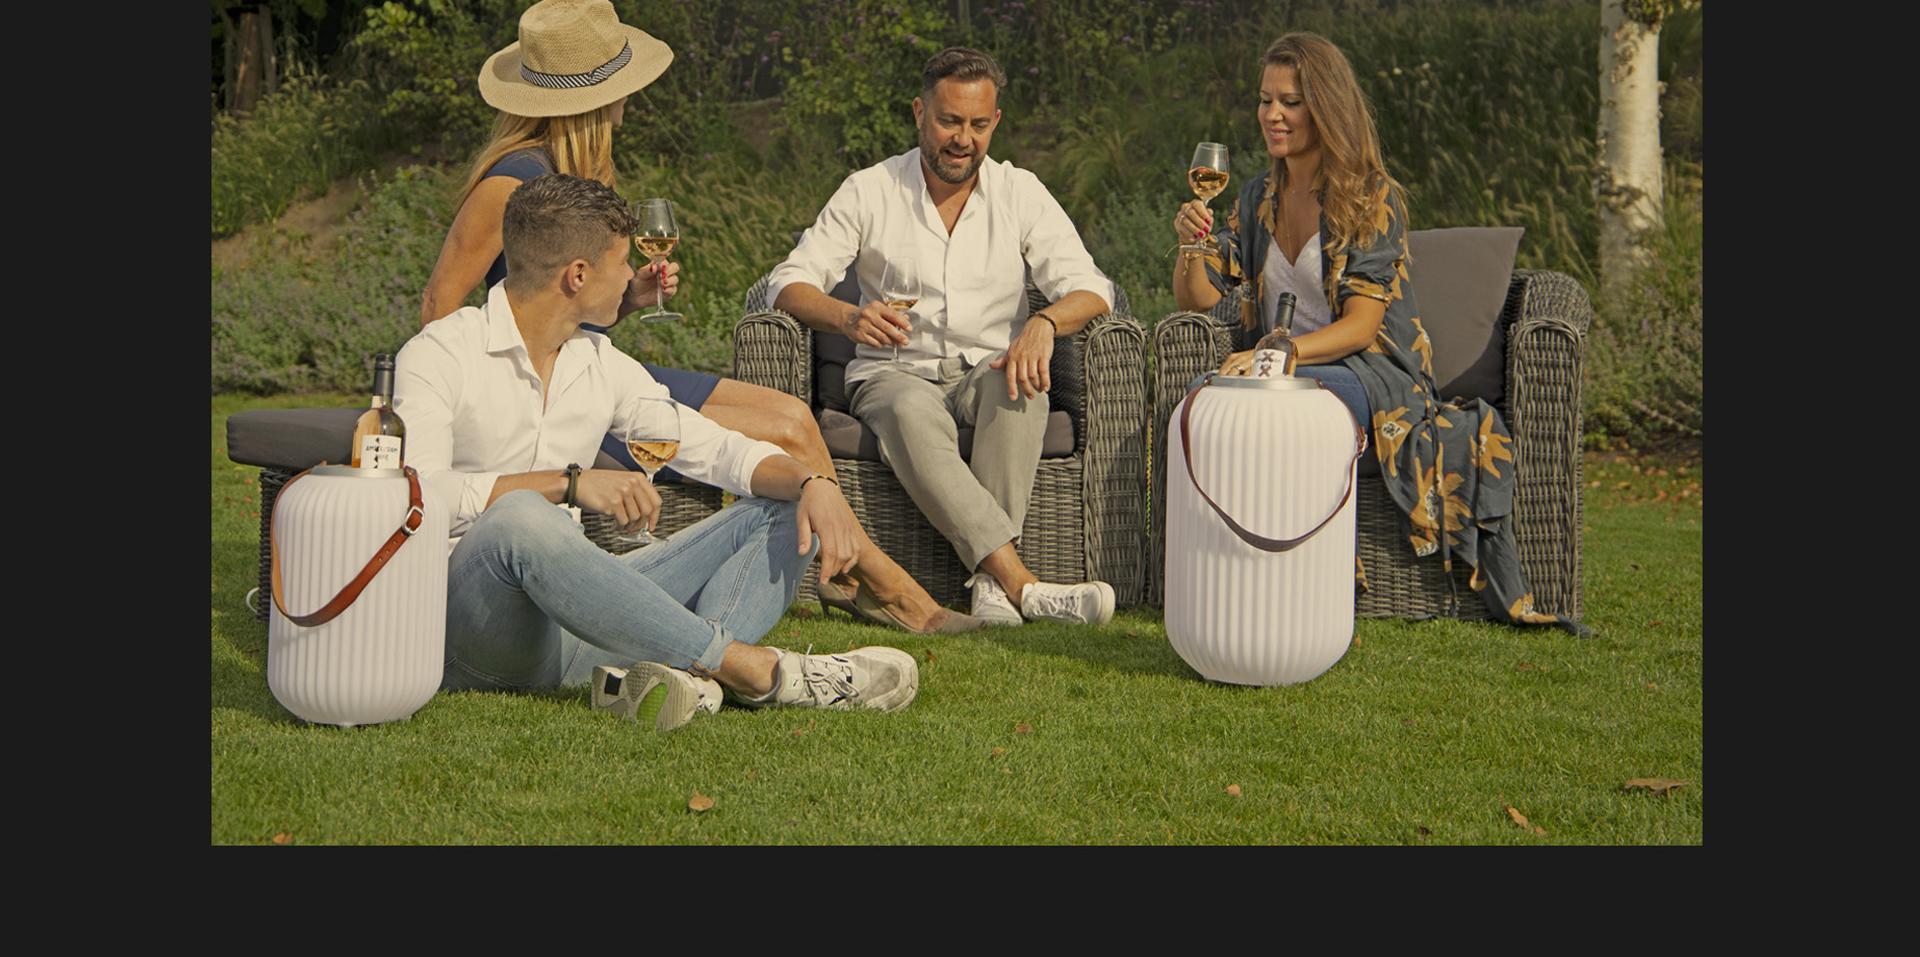 nikki-amsterda-banner-lampion-l-bluetooth-speaker-wine-cooler-led-lighting kopiëren